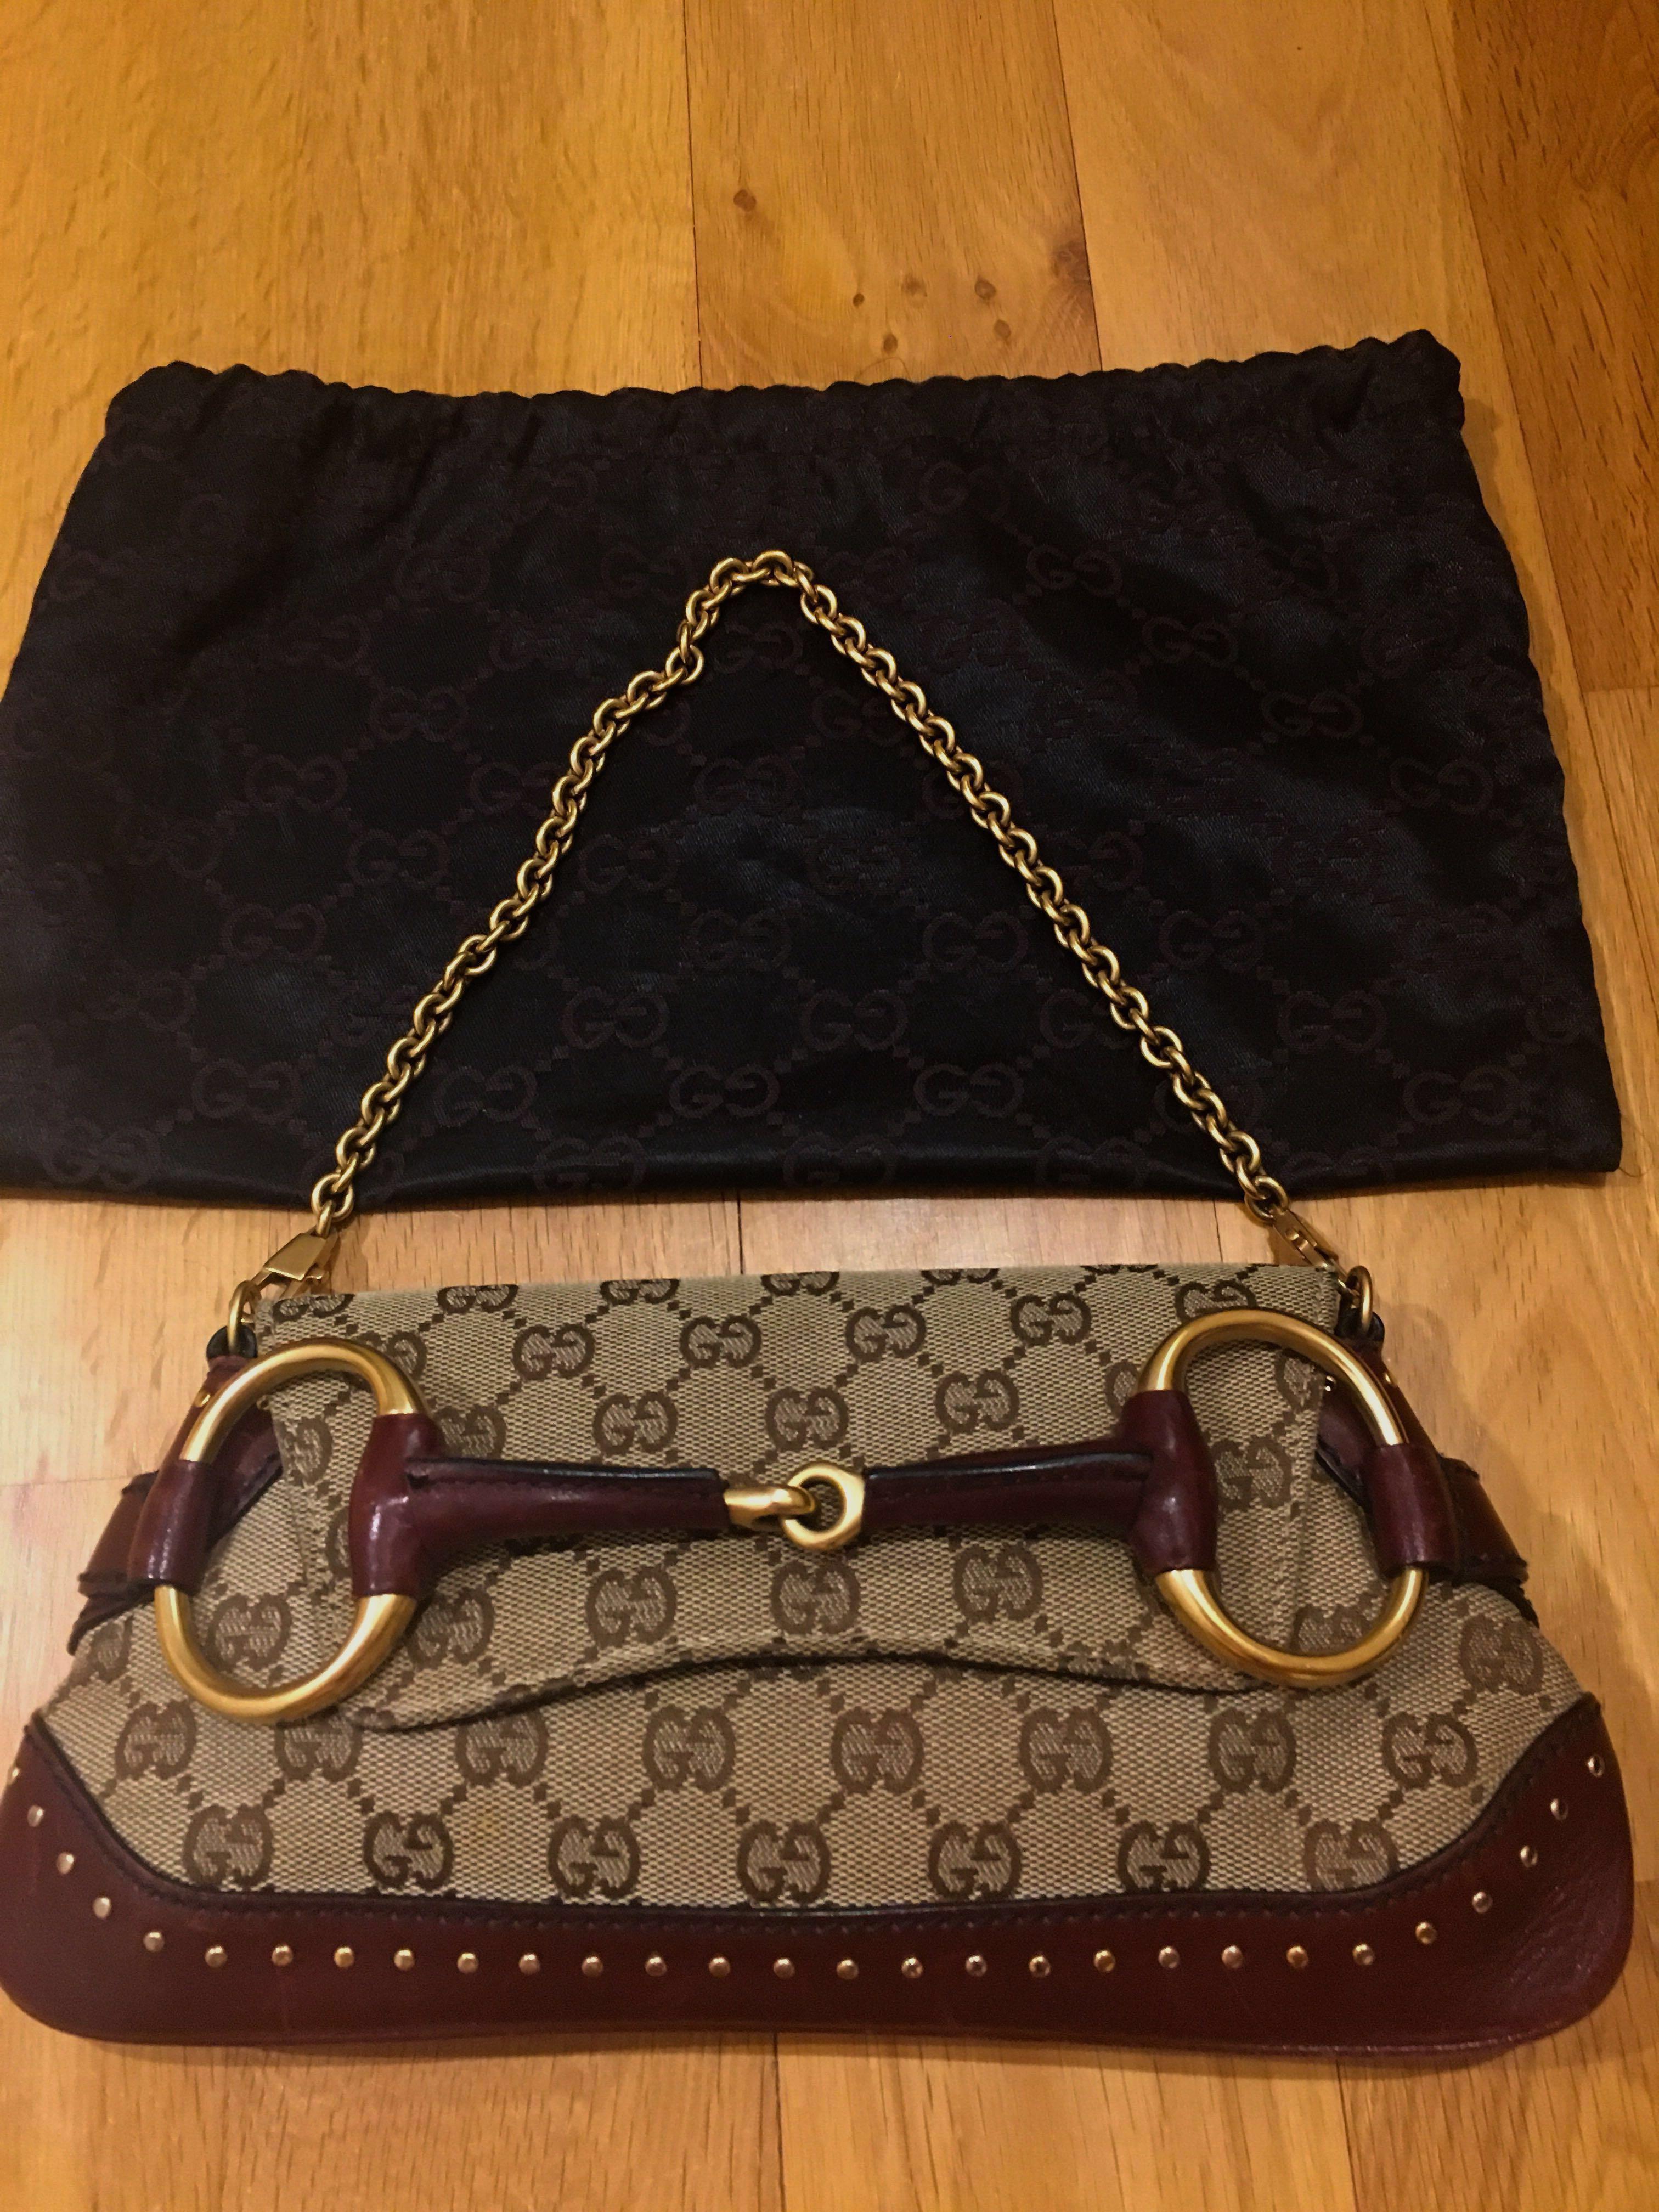 b6105d57172 Vintage Gucci Bag Clutch